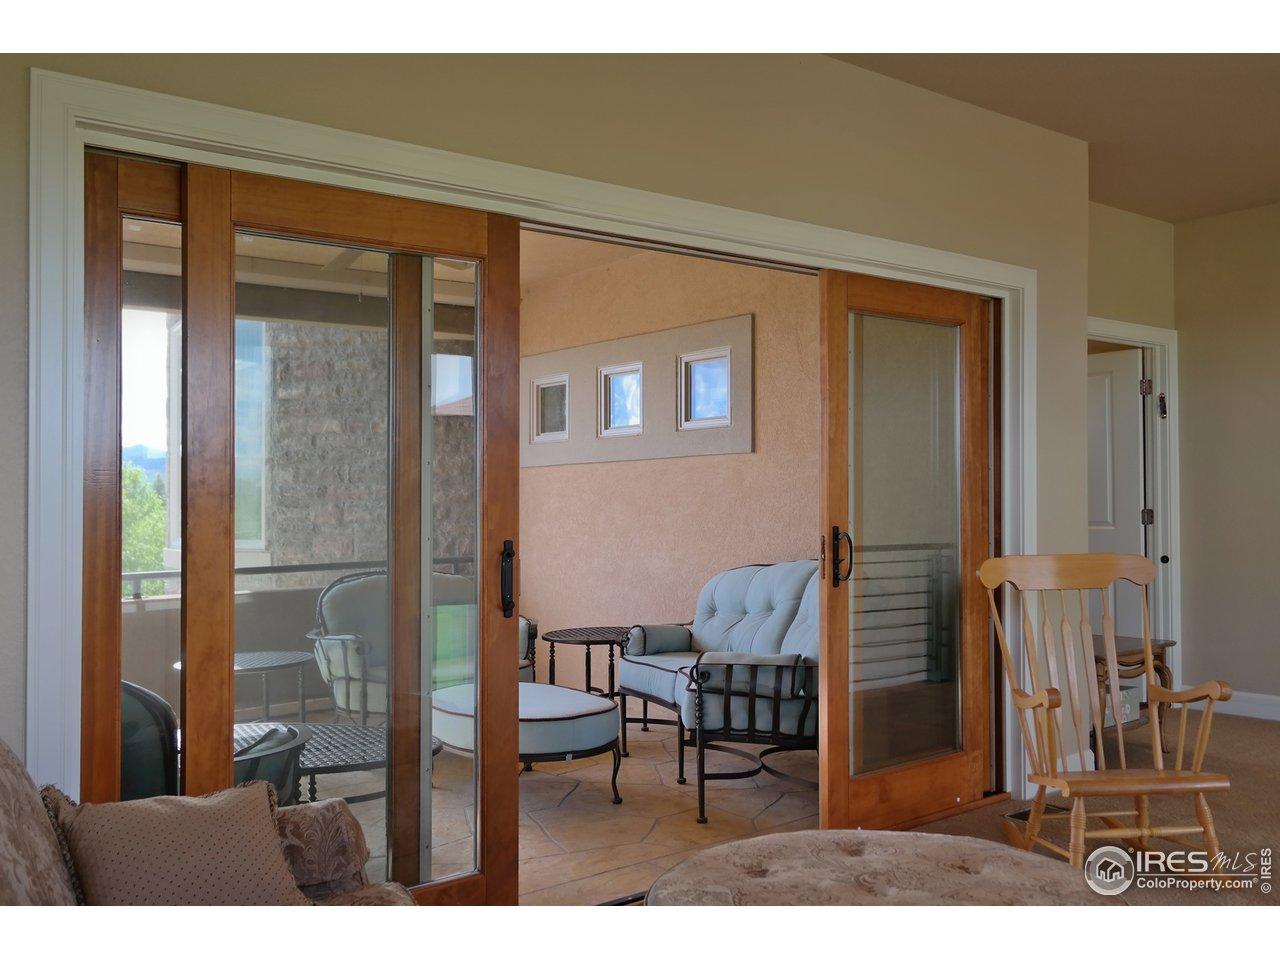 Custom Sliding Doors to Upper Covered Patio